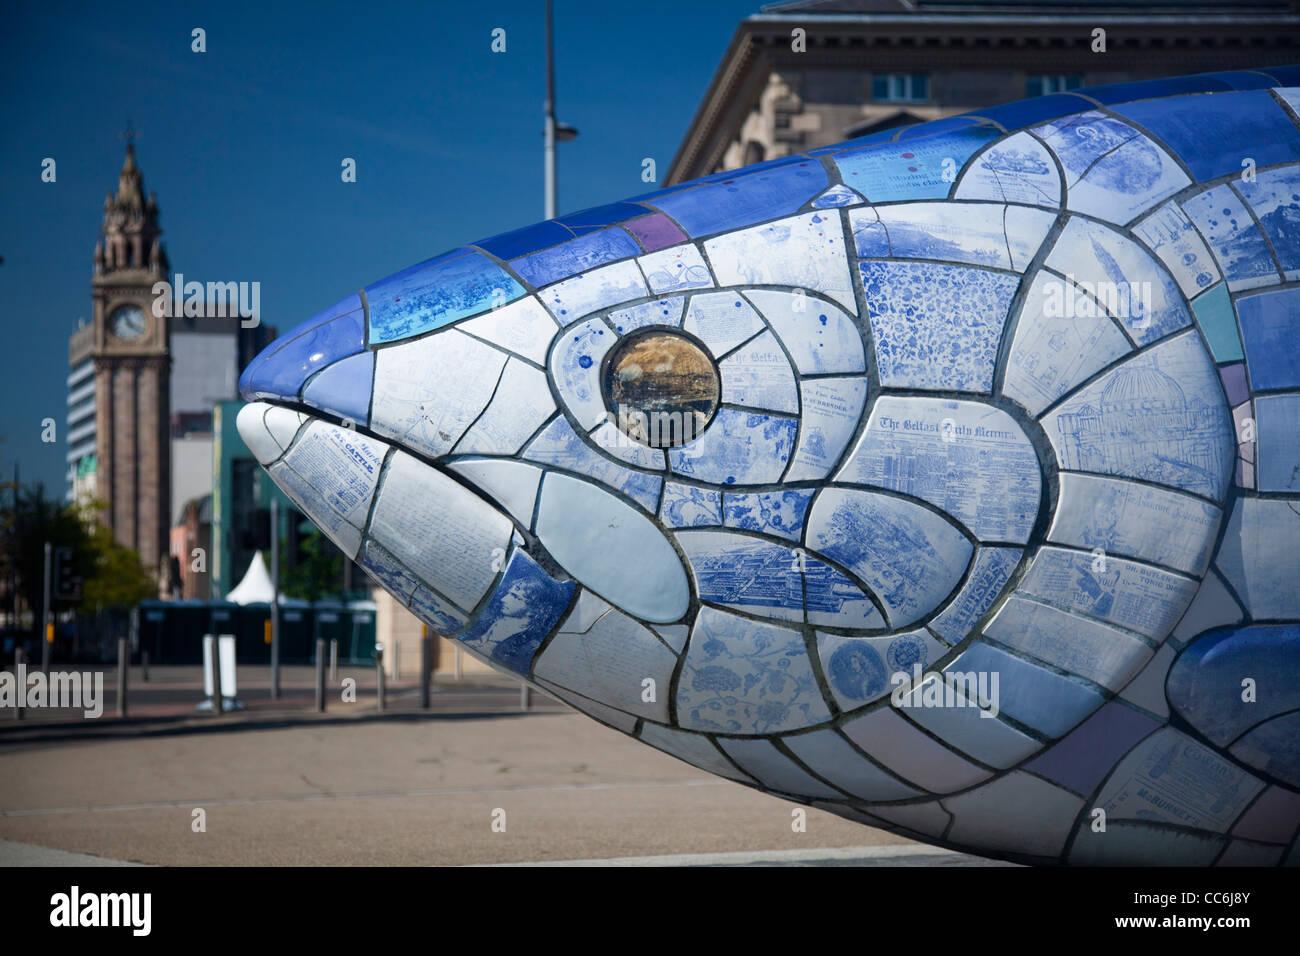 'The Big Fish' salmon sculpture by John Kindness, Belfast Waterfront, Belfast, County Antrim, Northern Ireland. - Stock Image